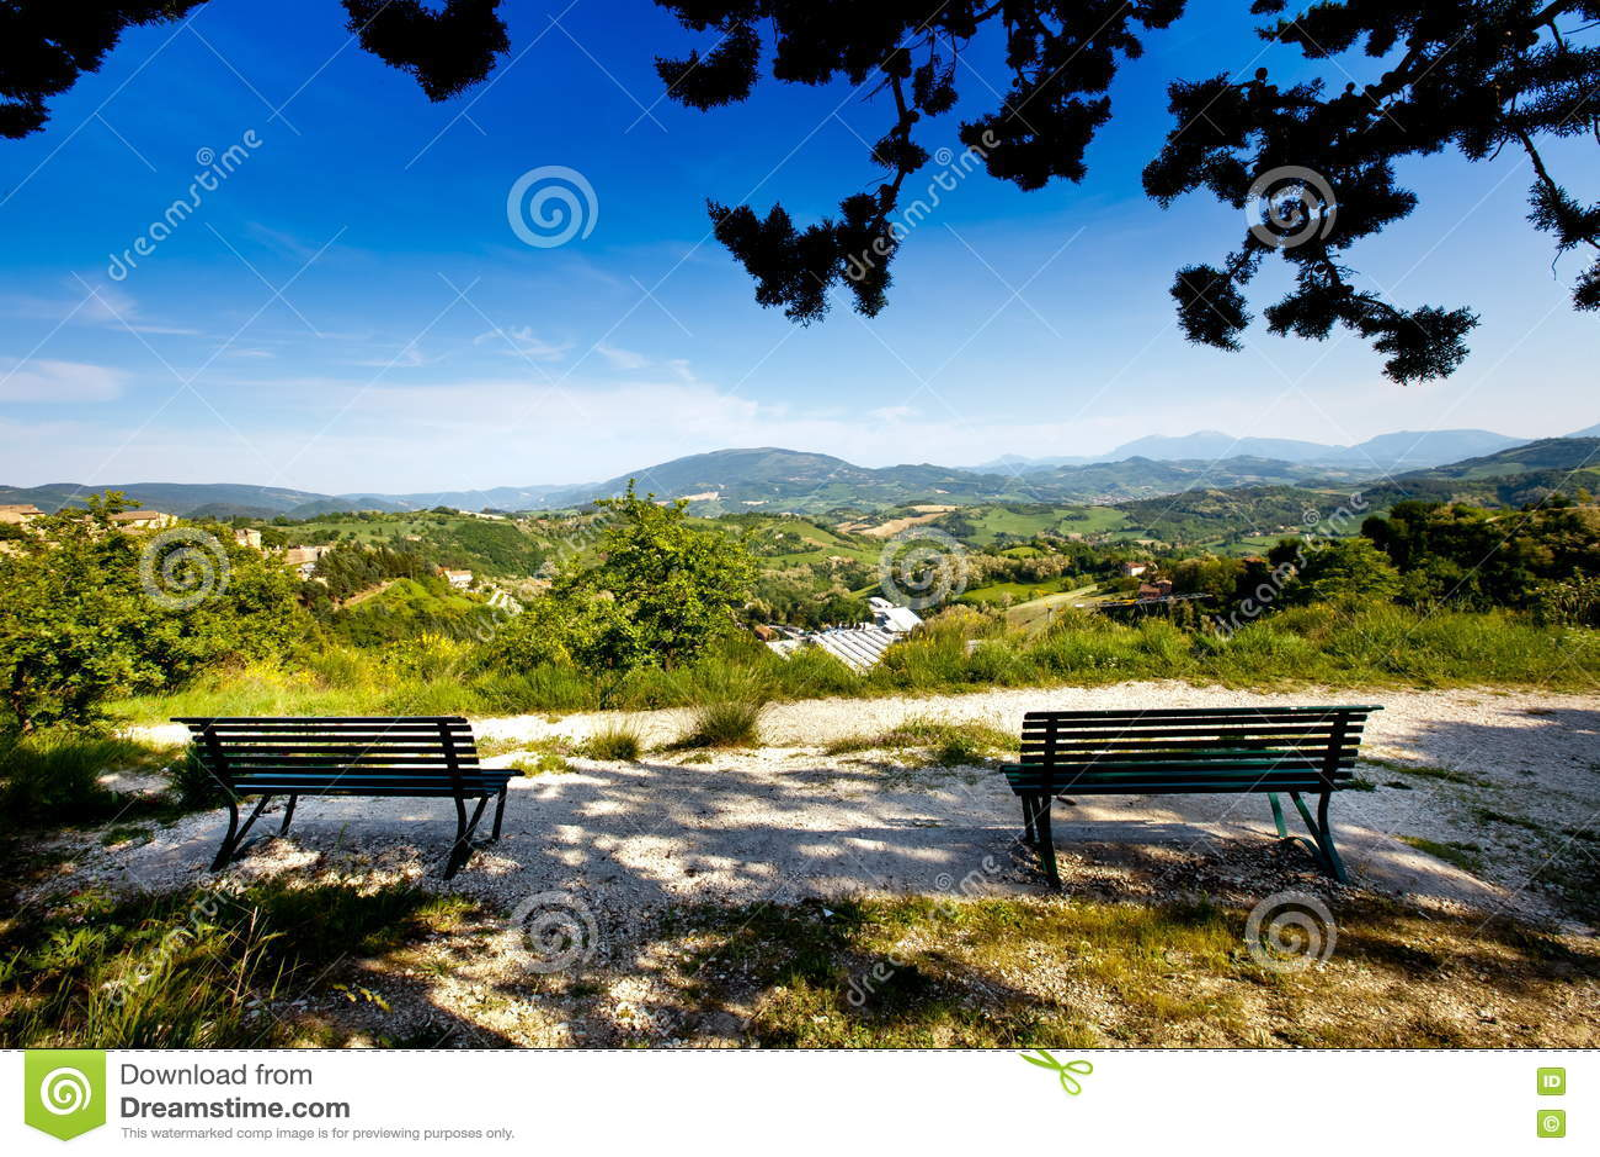 Beau paysage de Toscane